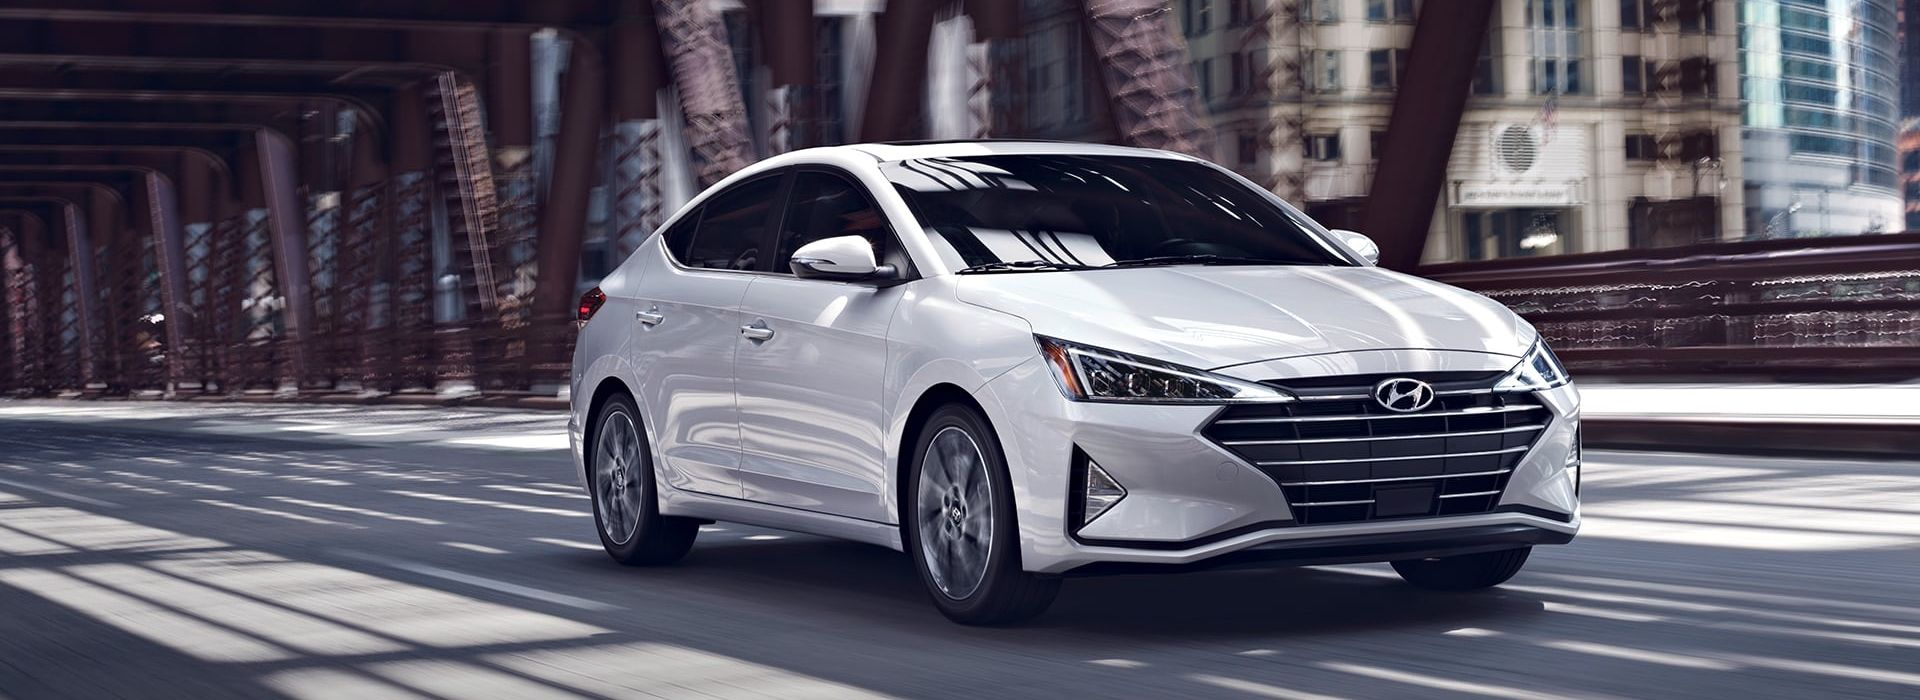 2019 Hyundai Elantra Leasing Near Manassas Va Pohanka Hyundai Of